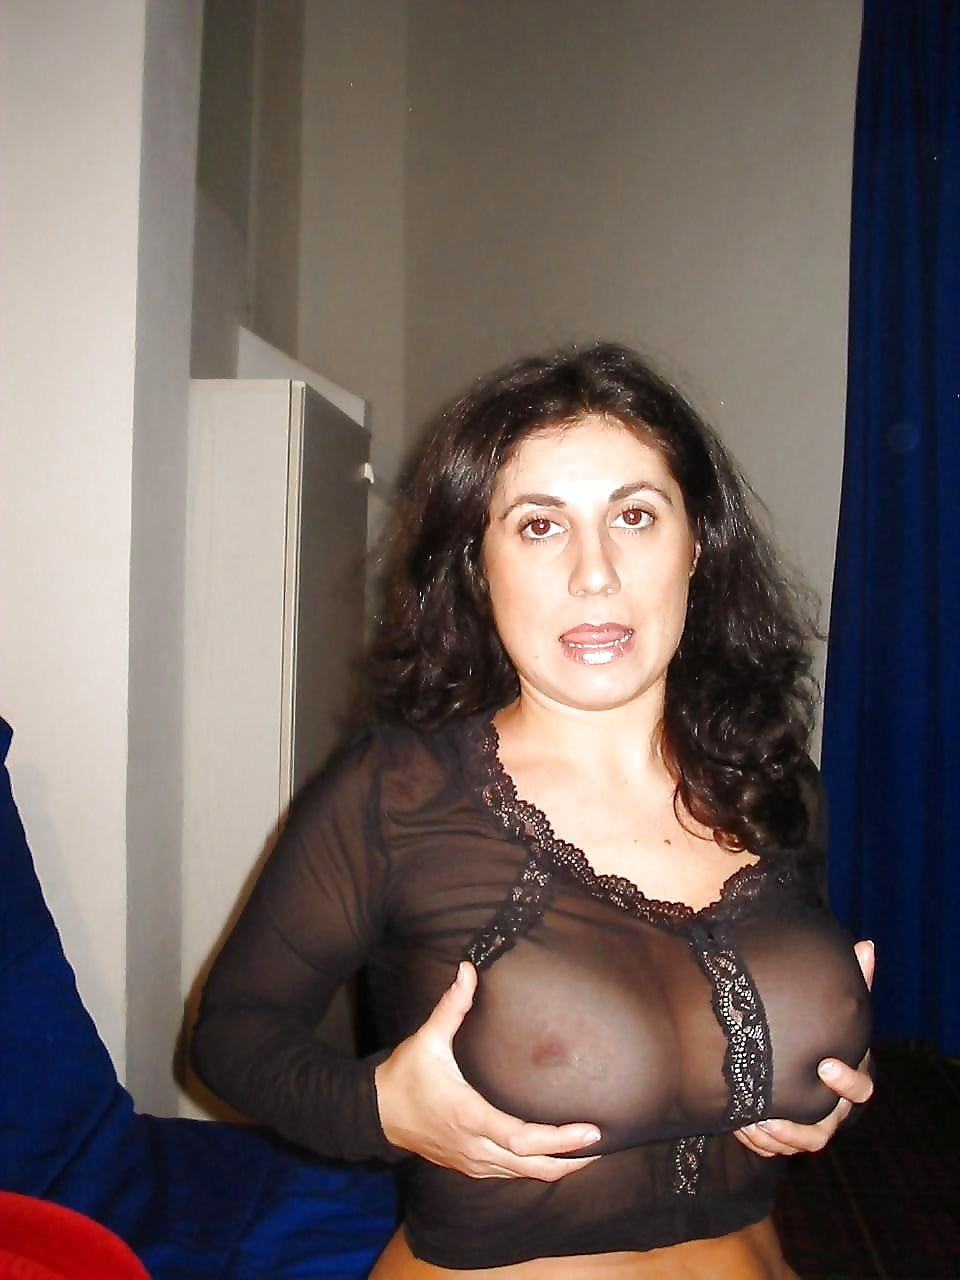 liu-taking-amateur-adult-actress-chicago